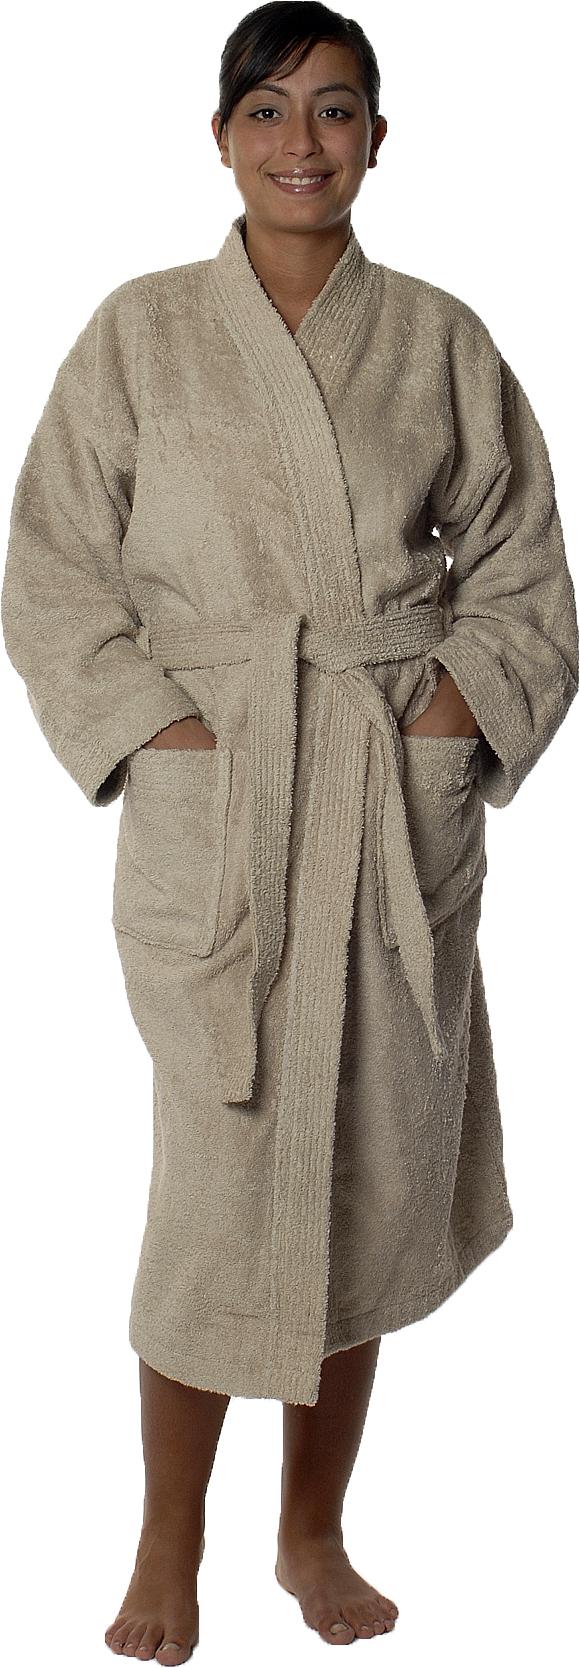 Peignoir col kimono en Coton couleur Ficelle Taille XL (Ficelle)